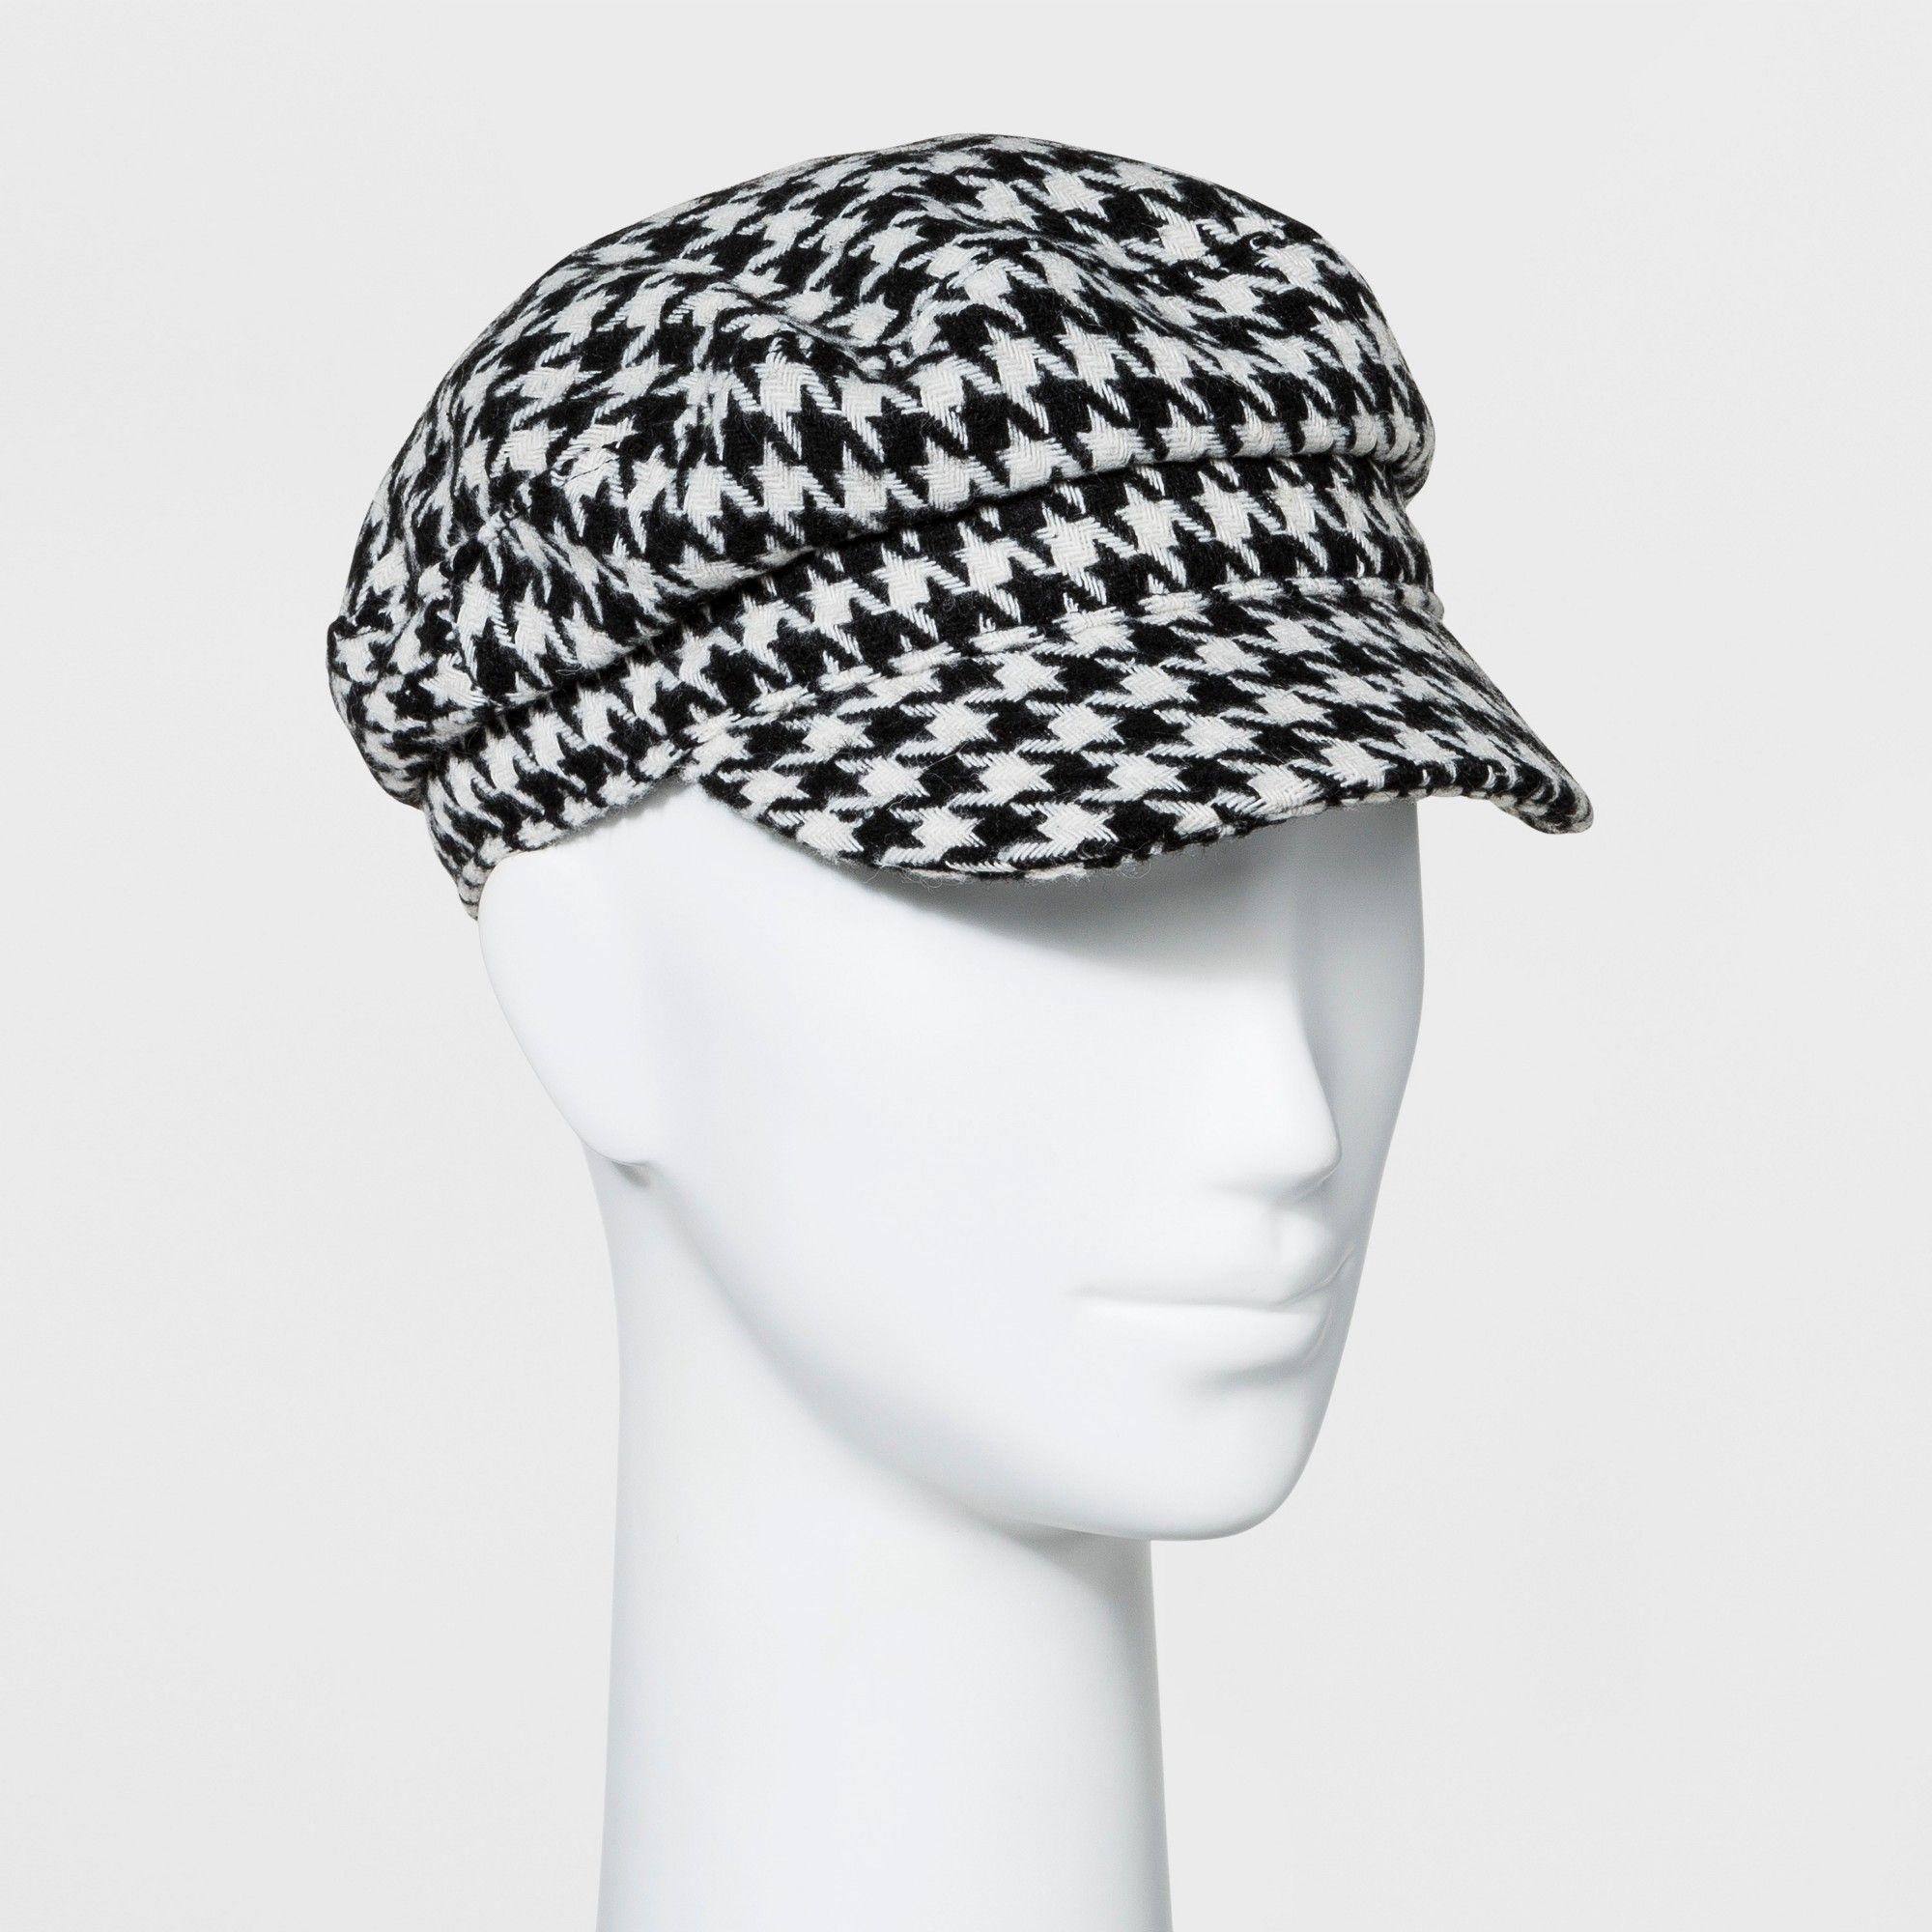 93d381523 Women's Baker Boy Hat - Wild Fable , Size: One Size, MultiColored ...